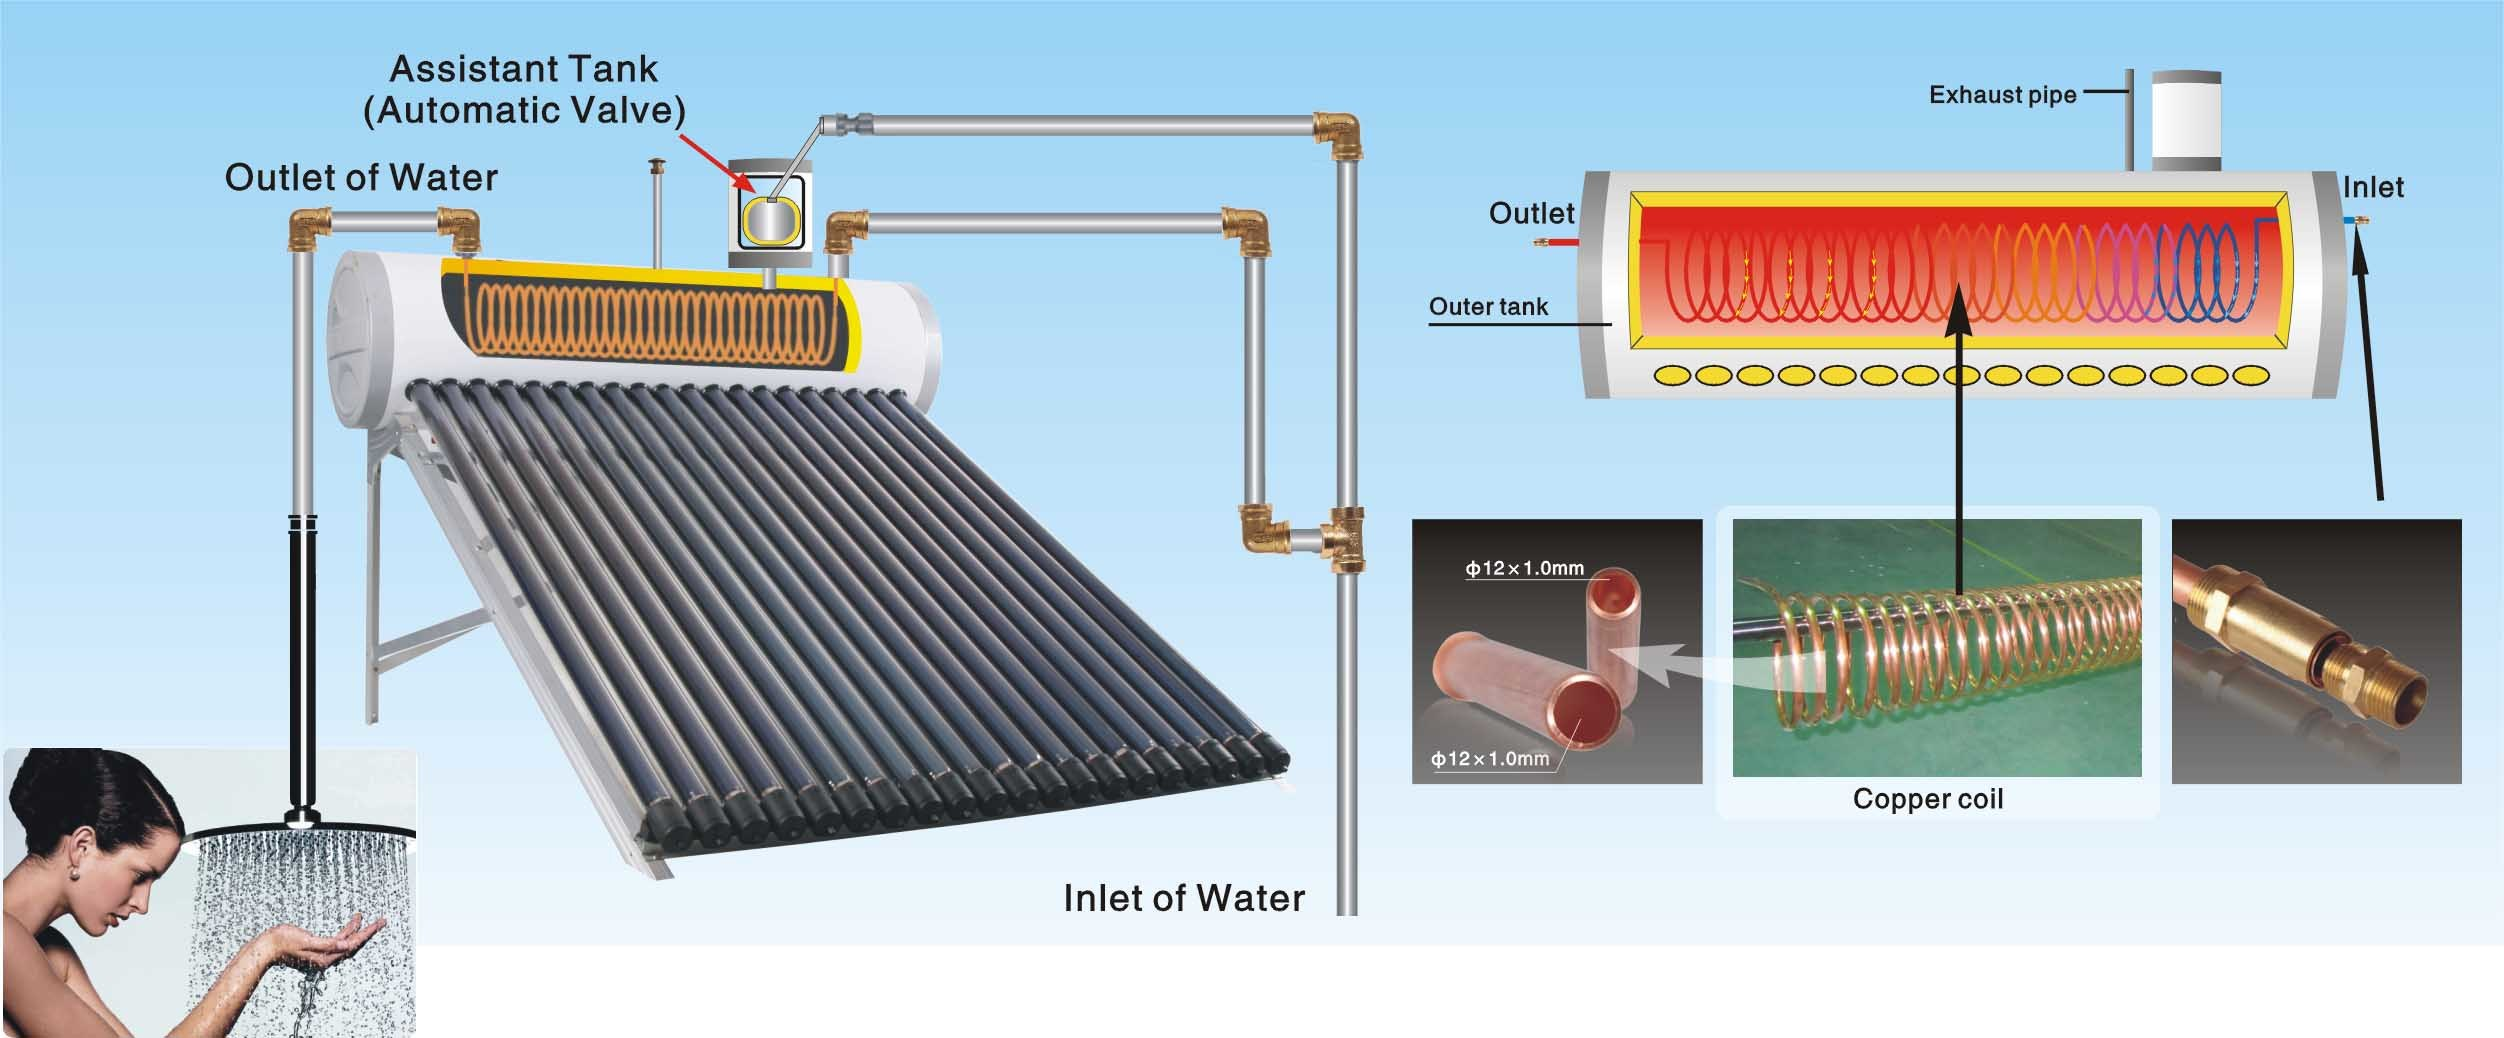 Chauffe eau solaire de thermosiphon chauffe eau solaire for Prix chauffe eau solaire